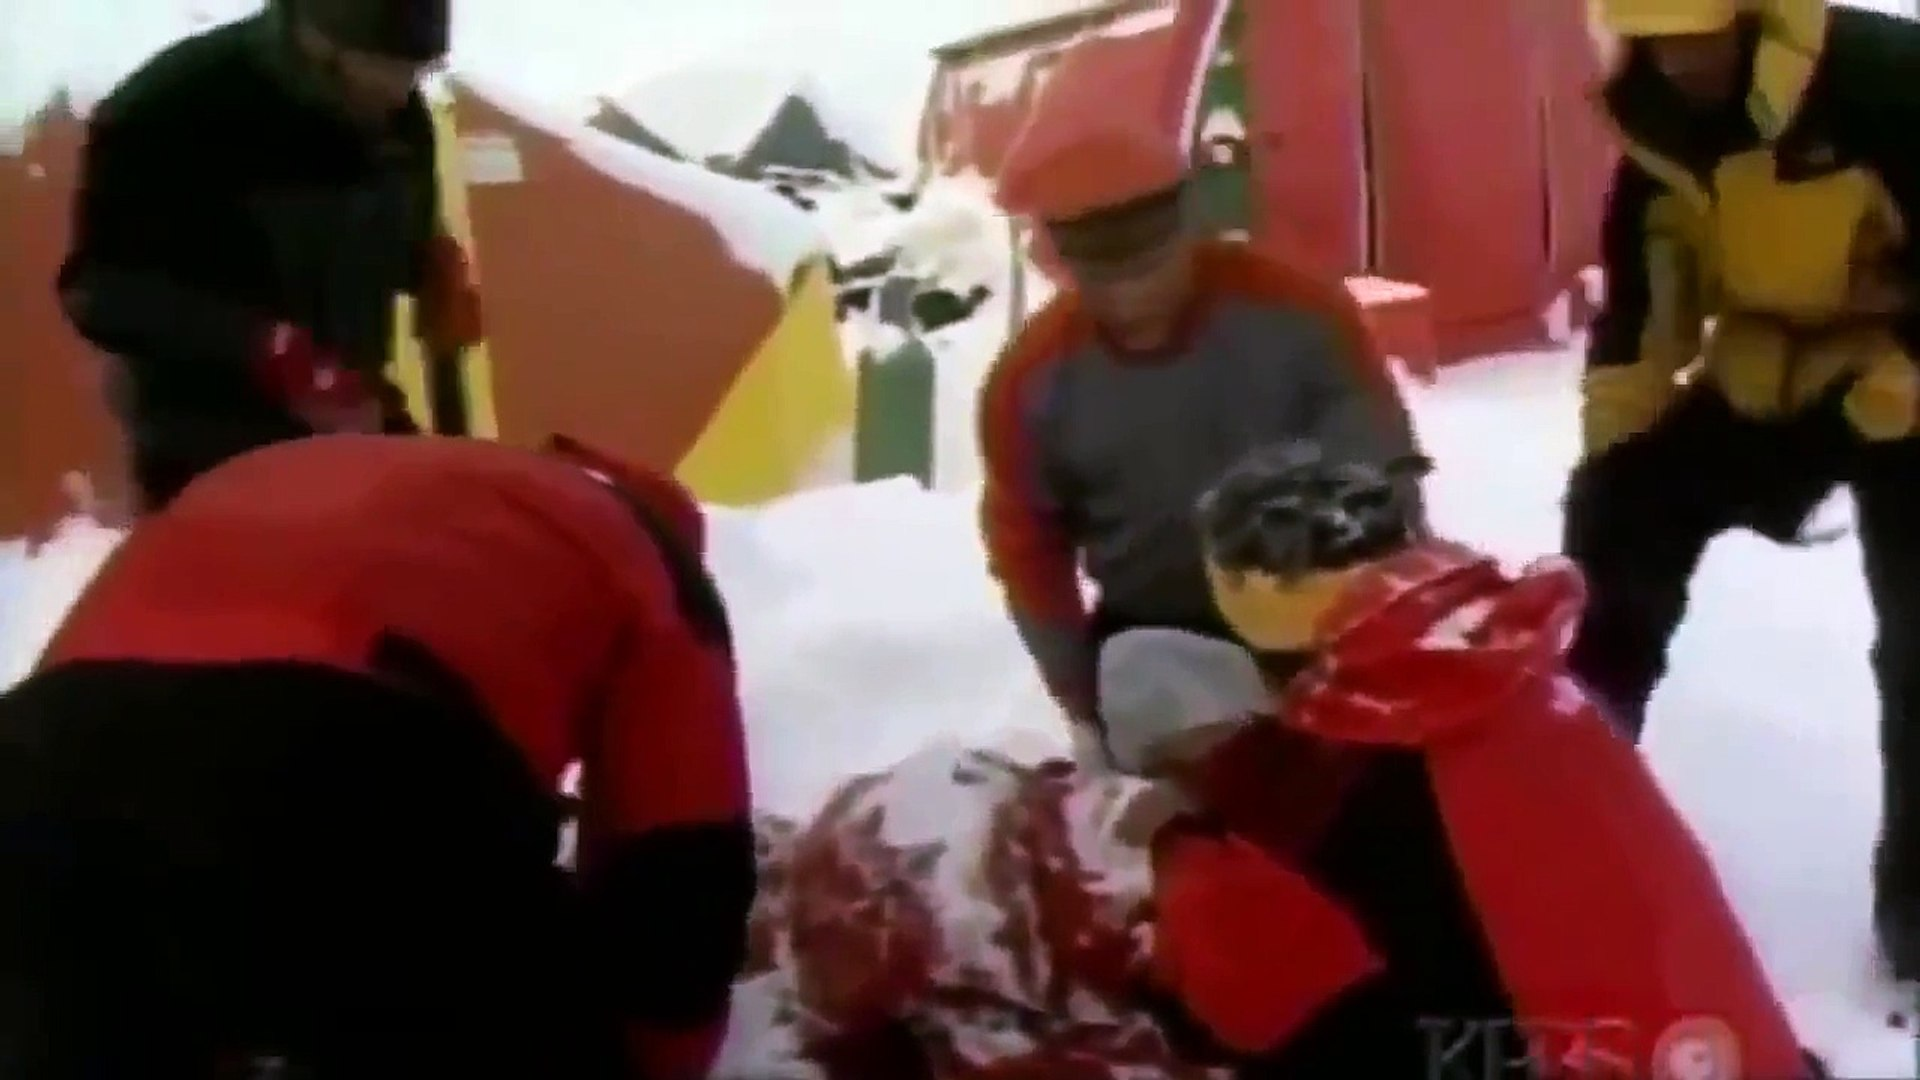 Denali (Mount McKinley) Deadly Ascent - Documentary HD , Tv series hd videos 2018 part 1/2